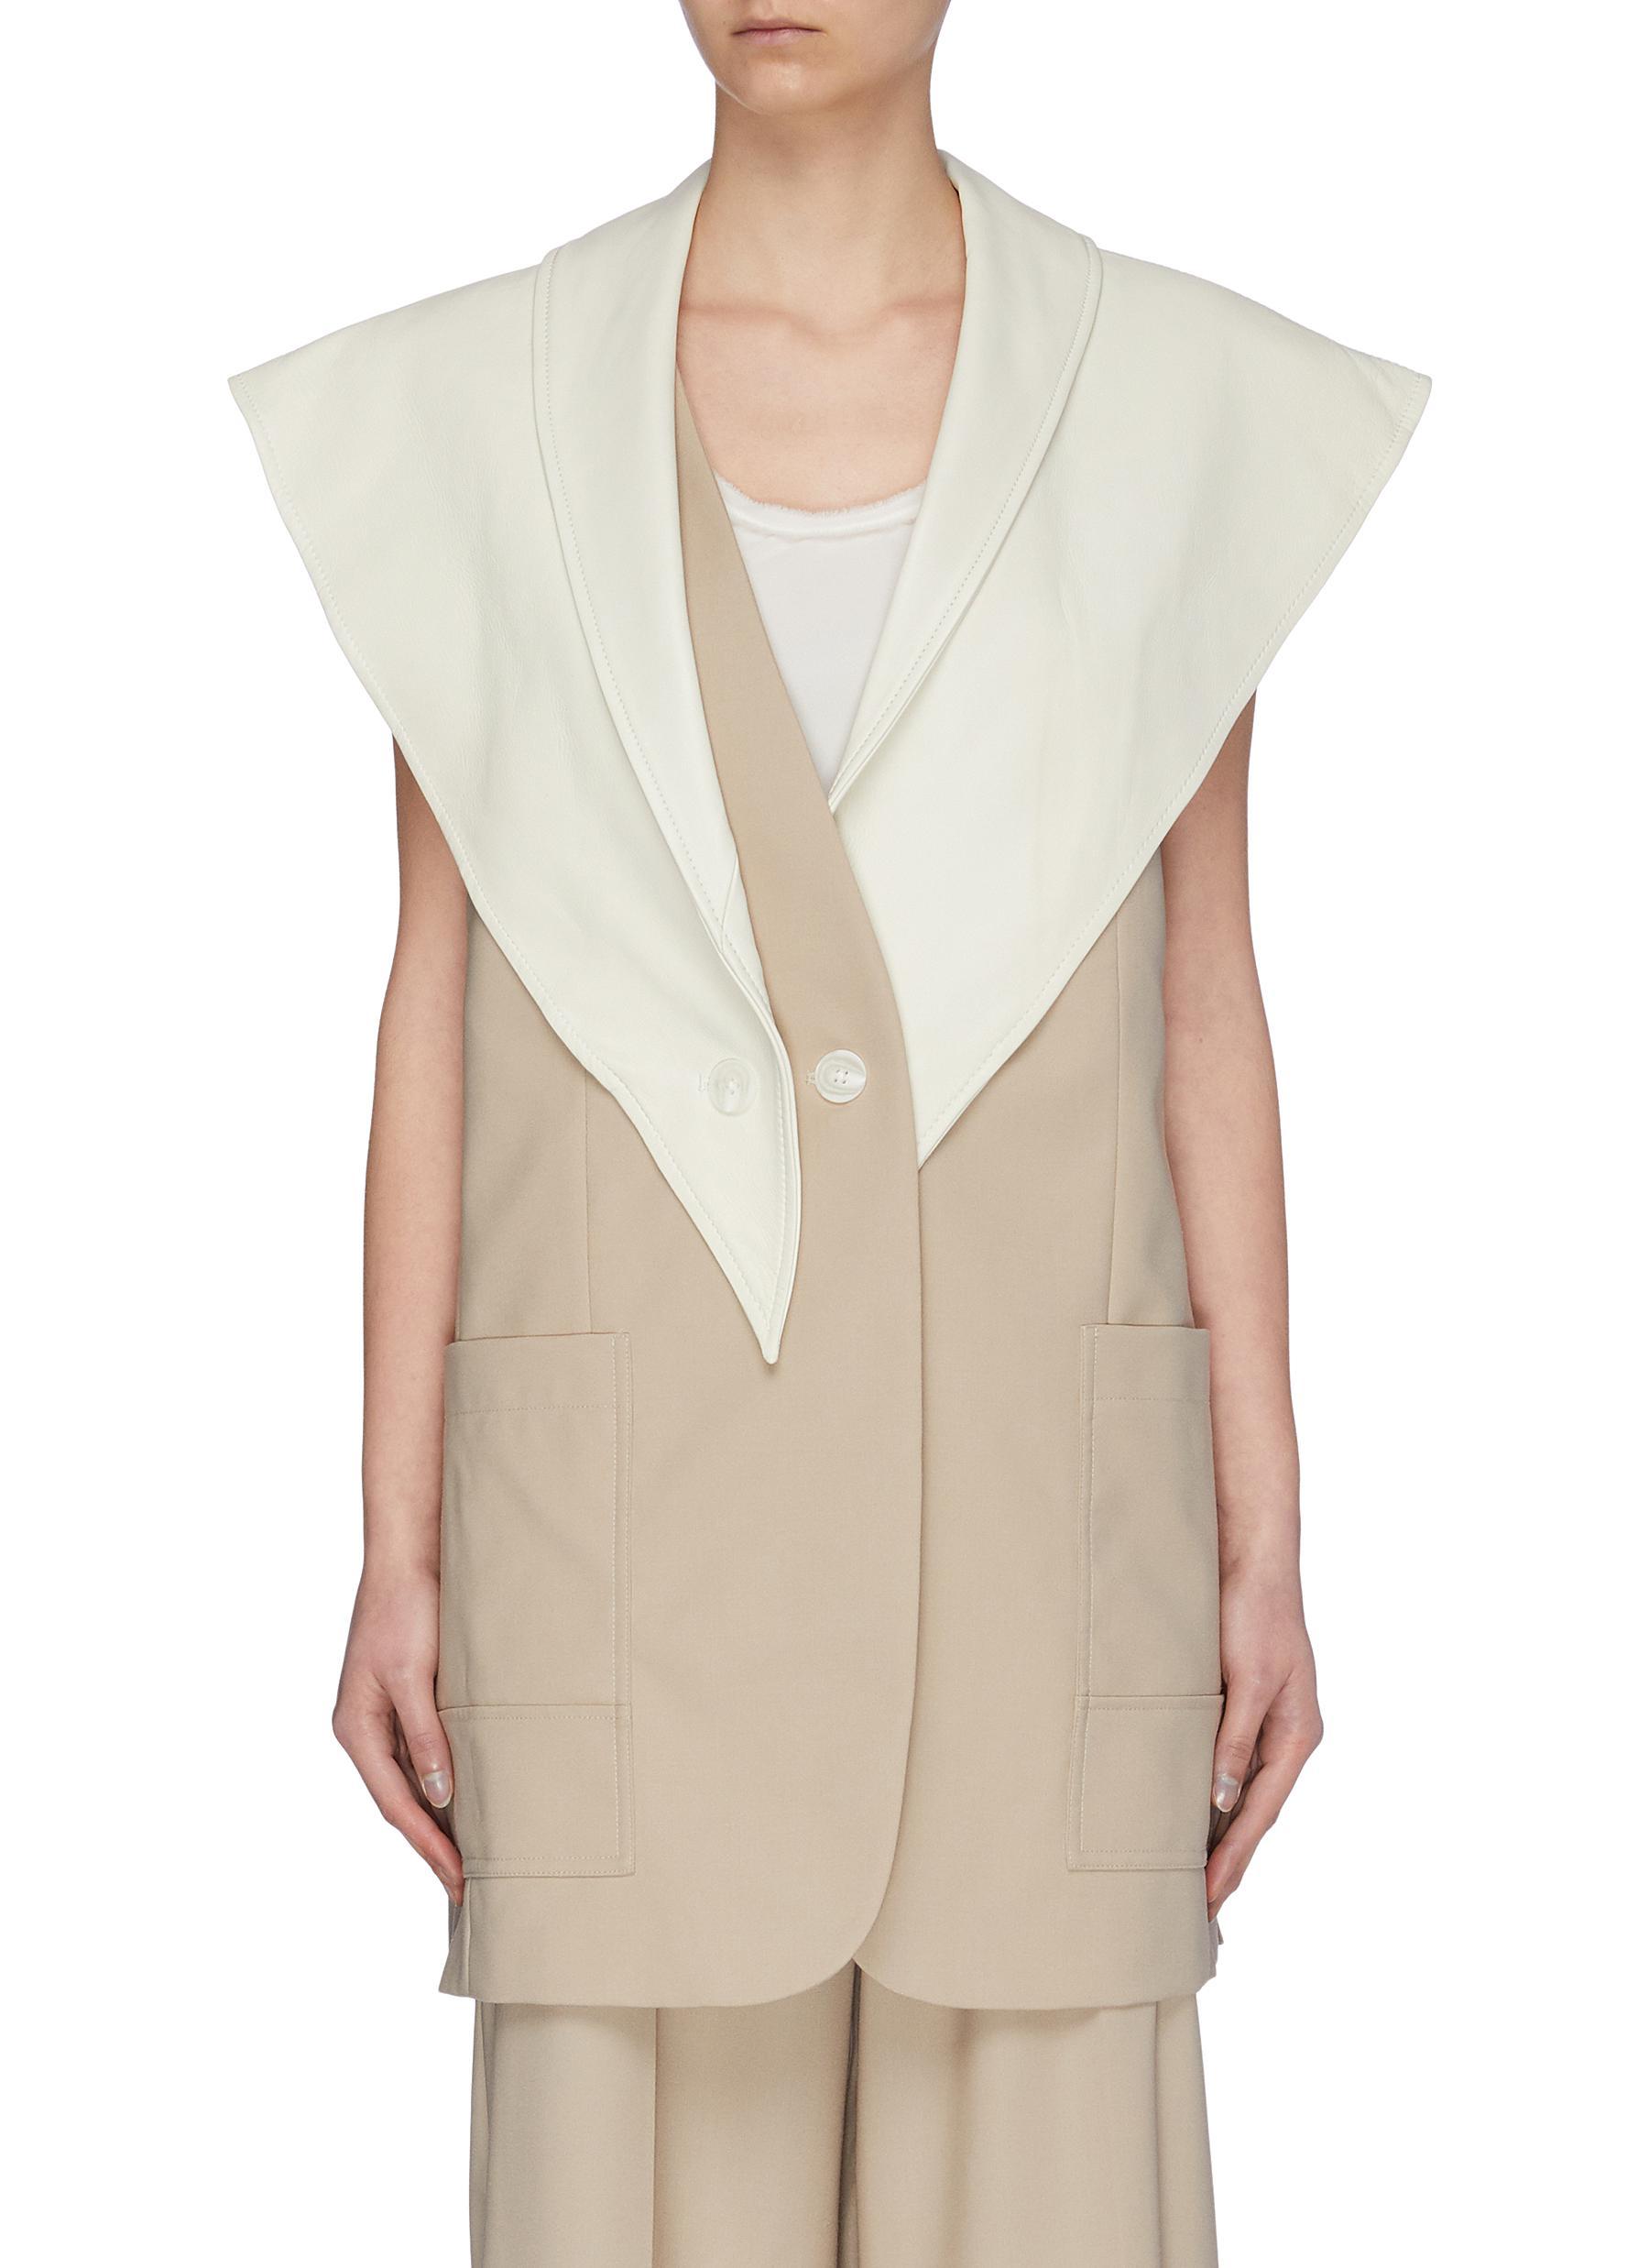 Detachable leather scarf wool vest - 3.1 PHILLIP LIM - Modalova